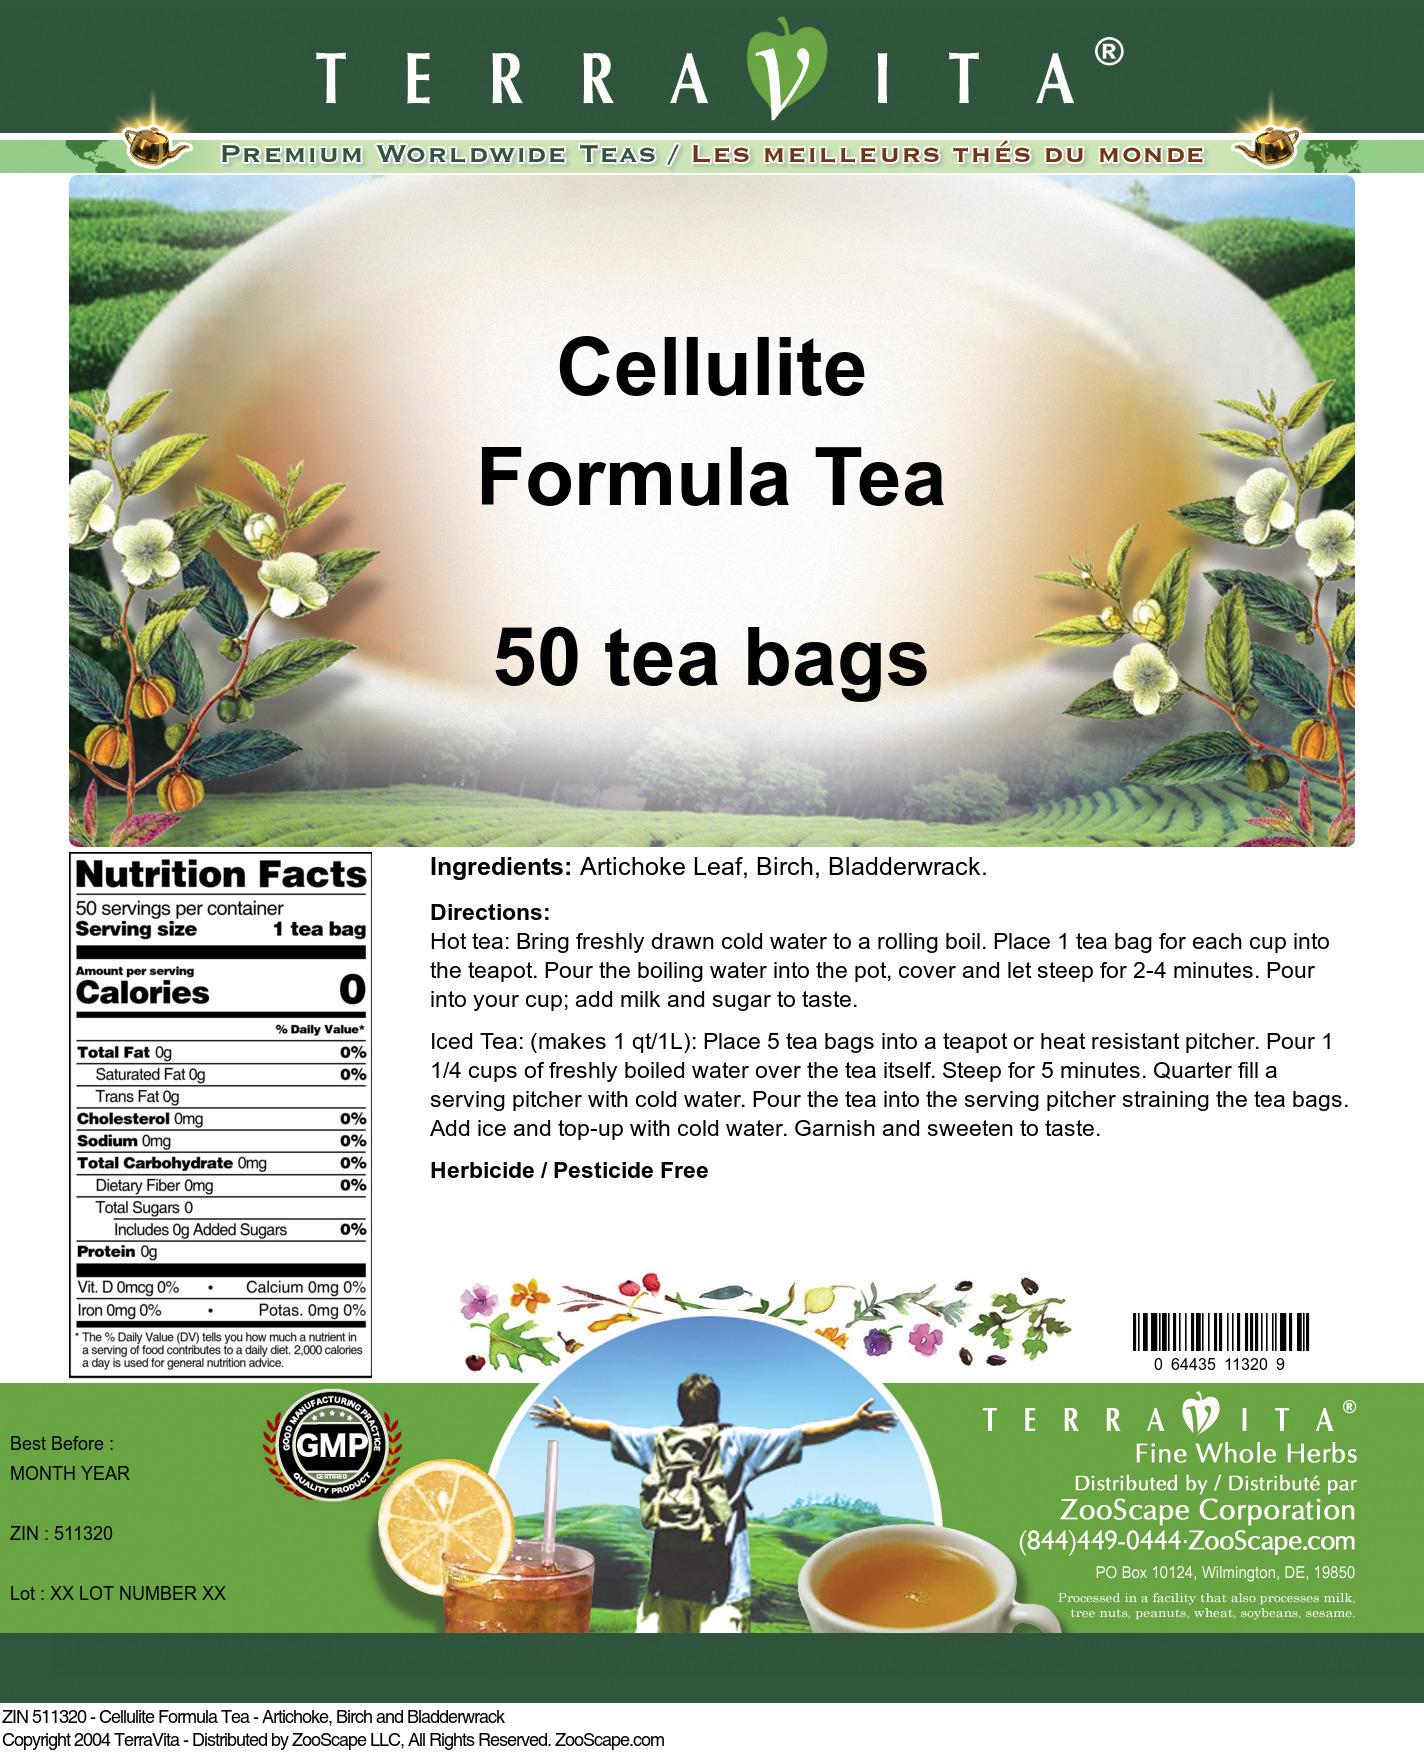 Cellulite Formula Tea - Artichoke, Birch and Bladderwrack